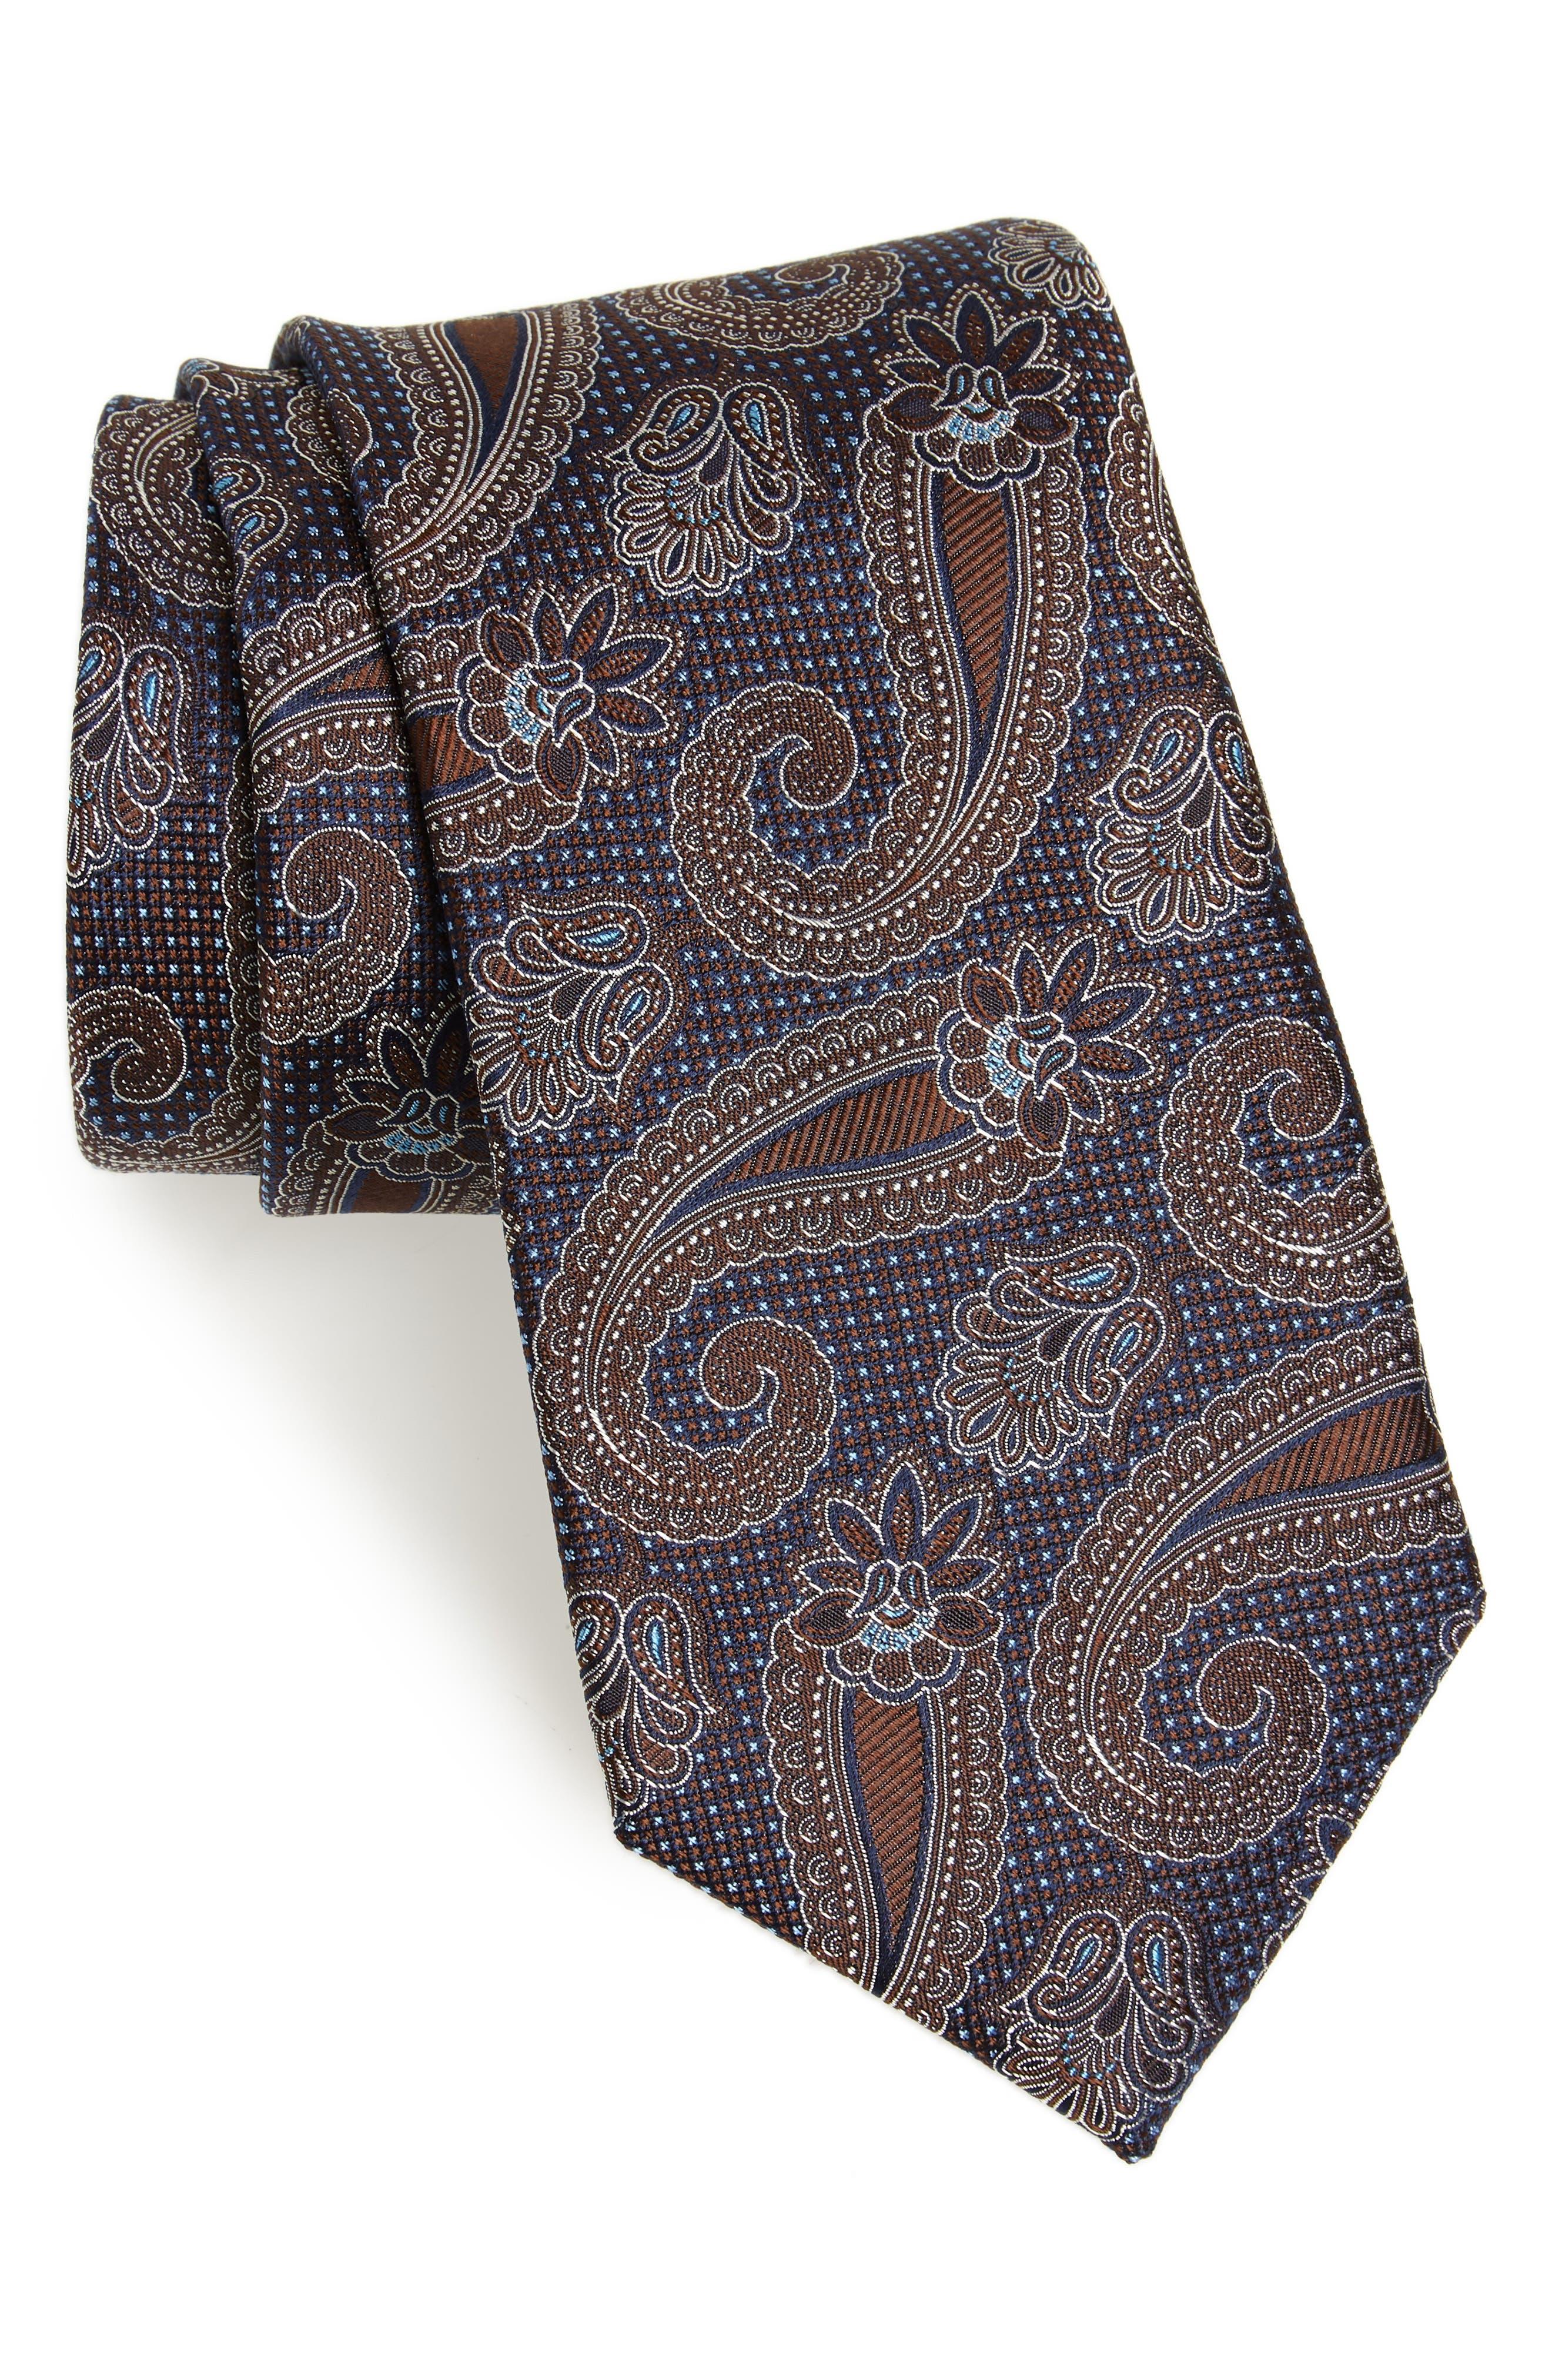 Emery Paisley Silk Tie,                             Main thumbnail 1, color,                             BROWN